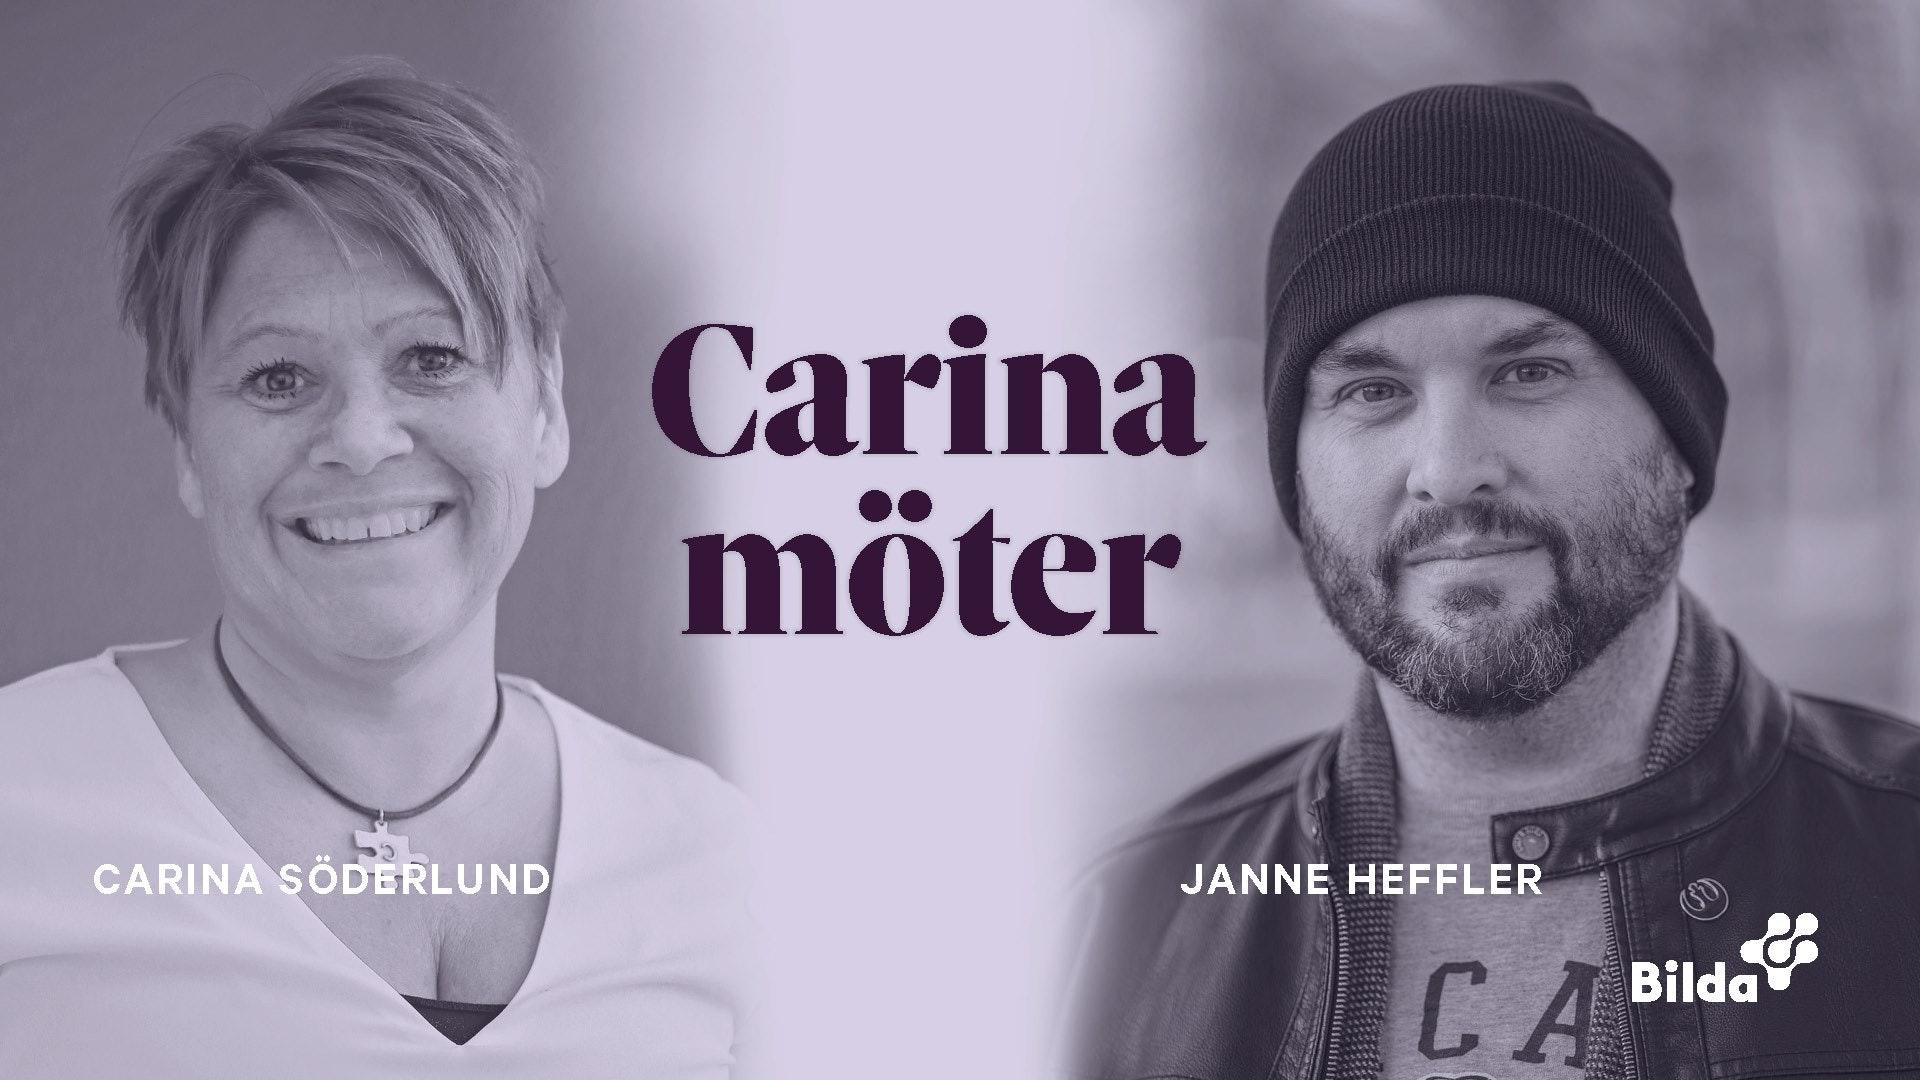 Carina möter Janne Heffler under temat psykisk ohälsa, live via Facebook.